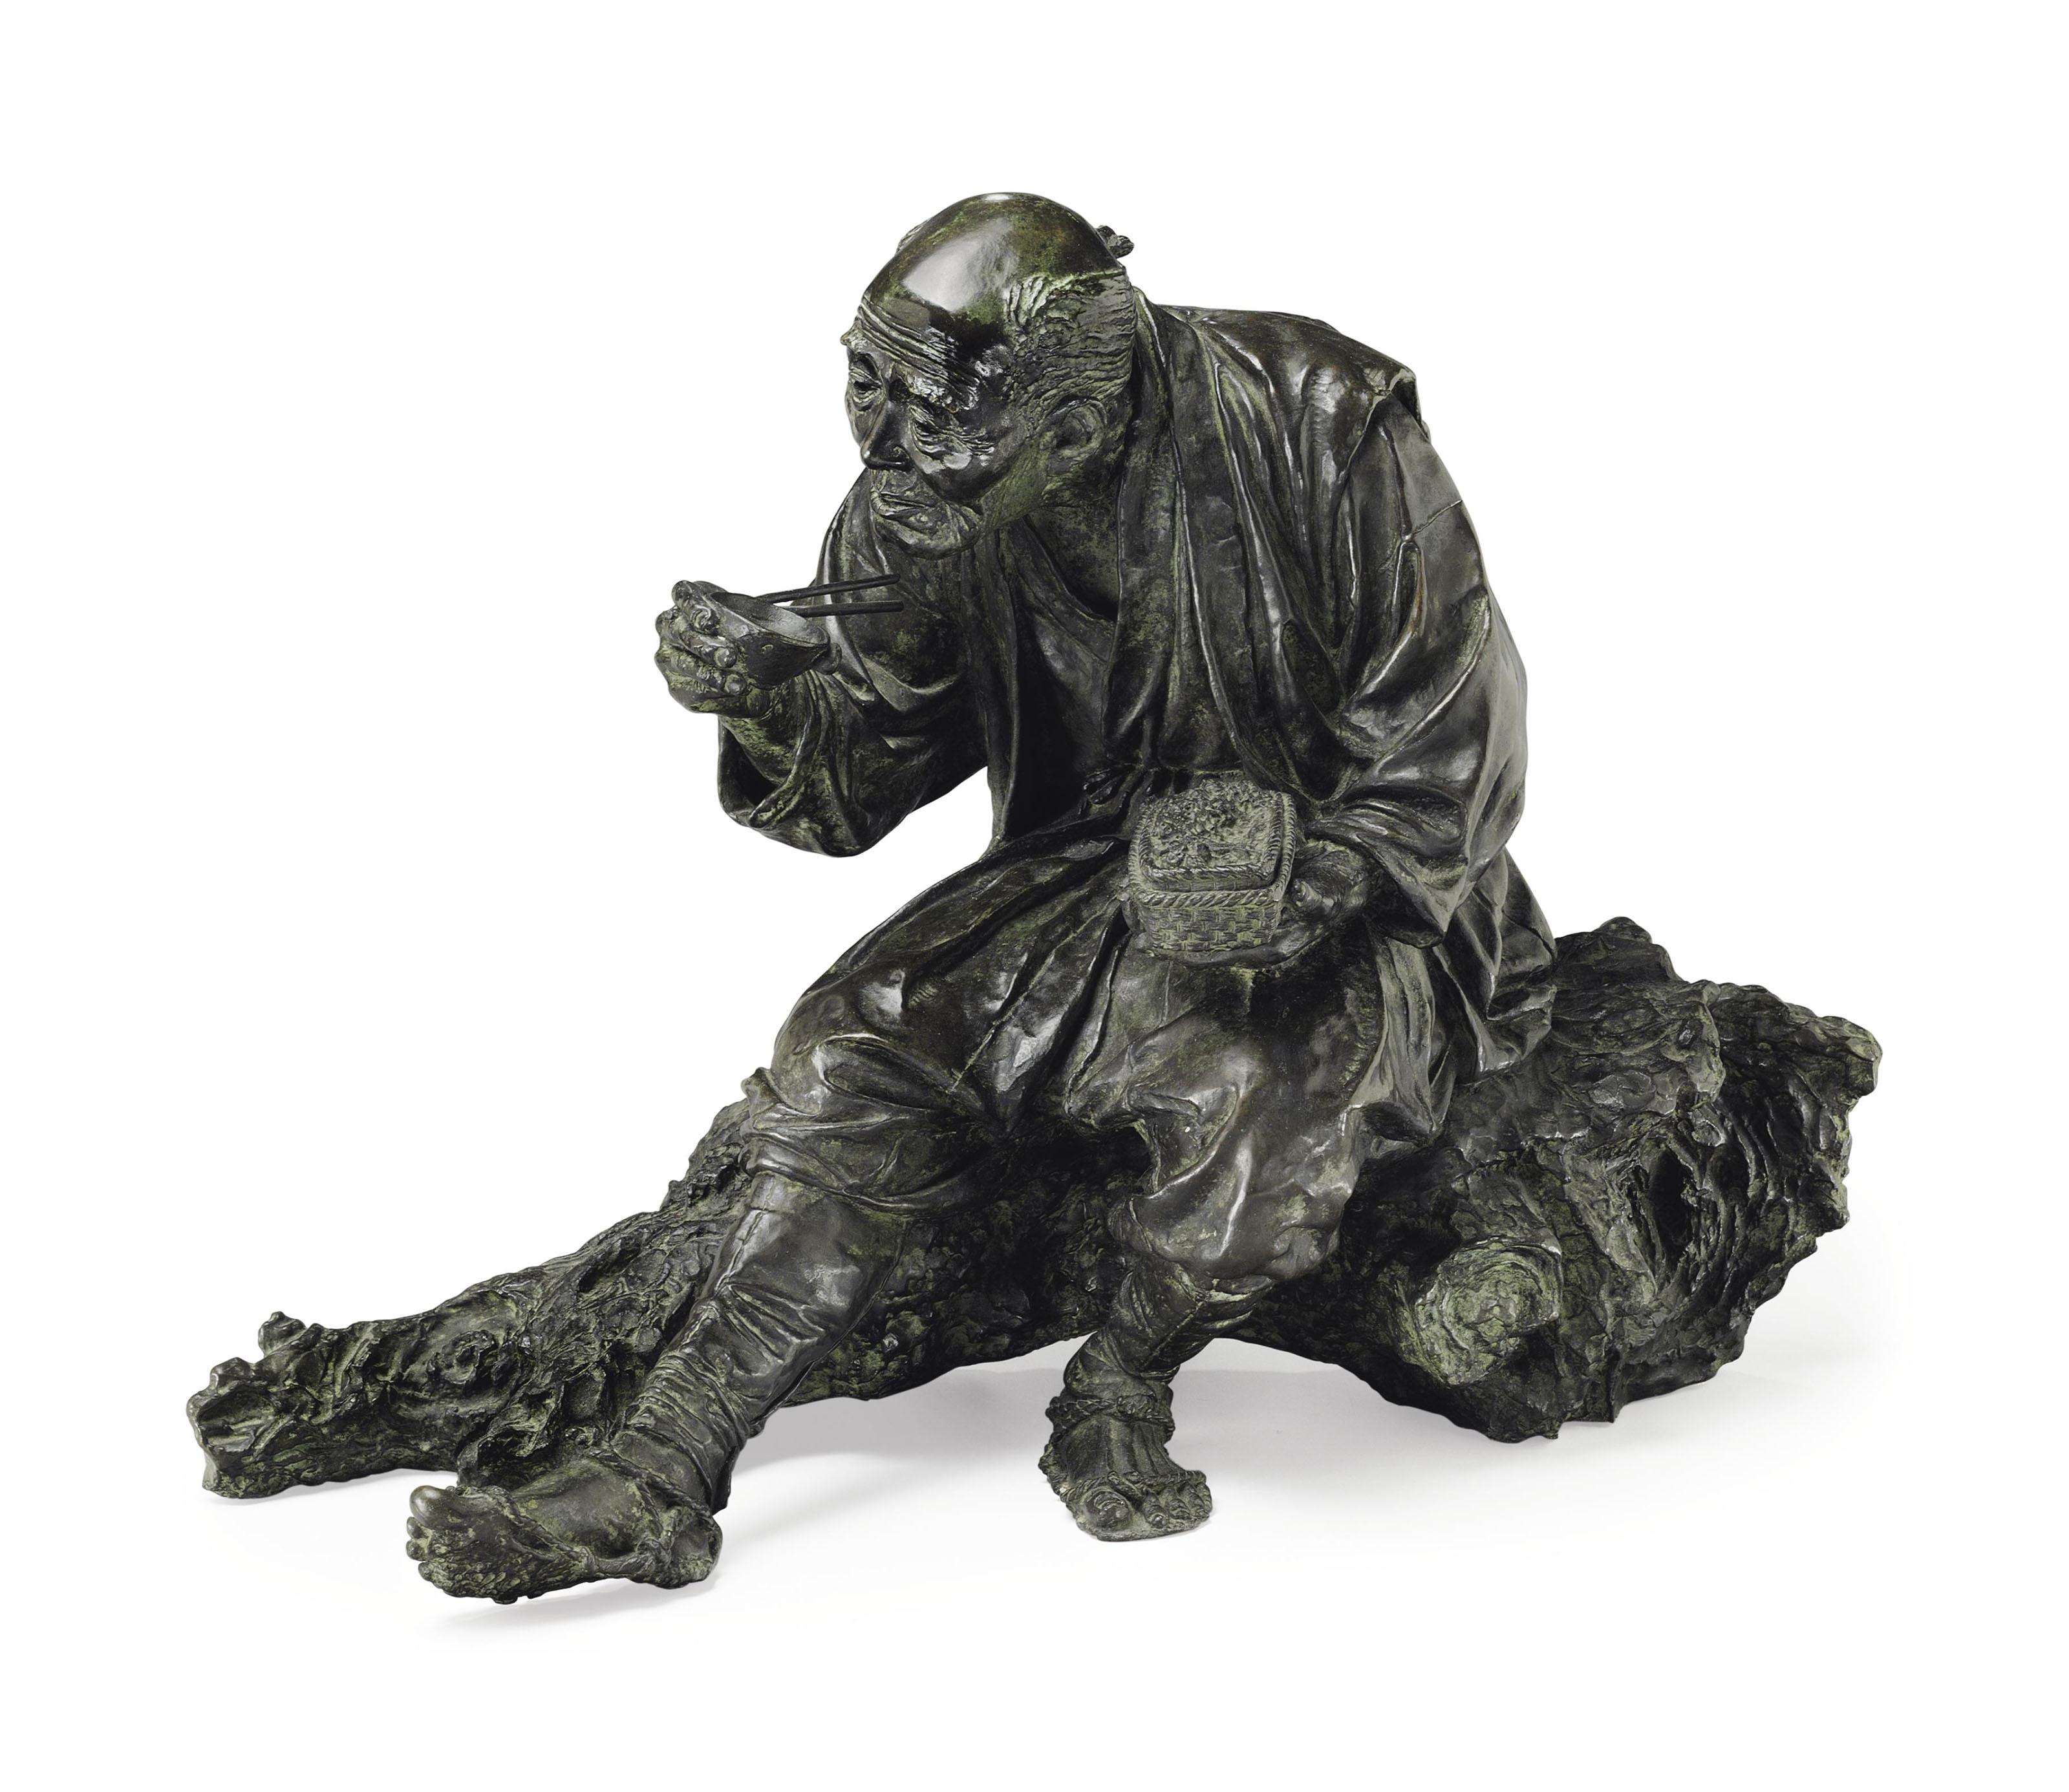 A bronze model of an old man